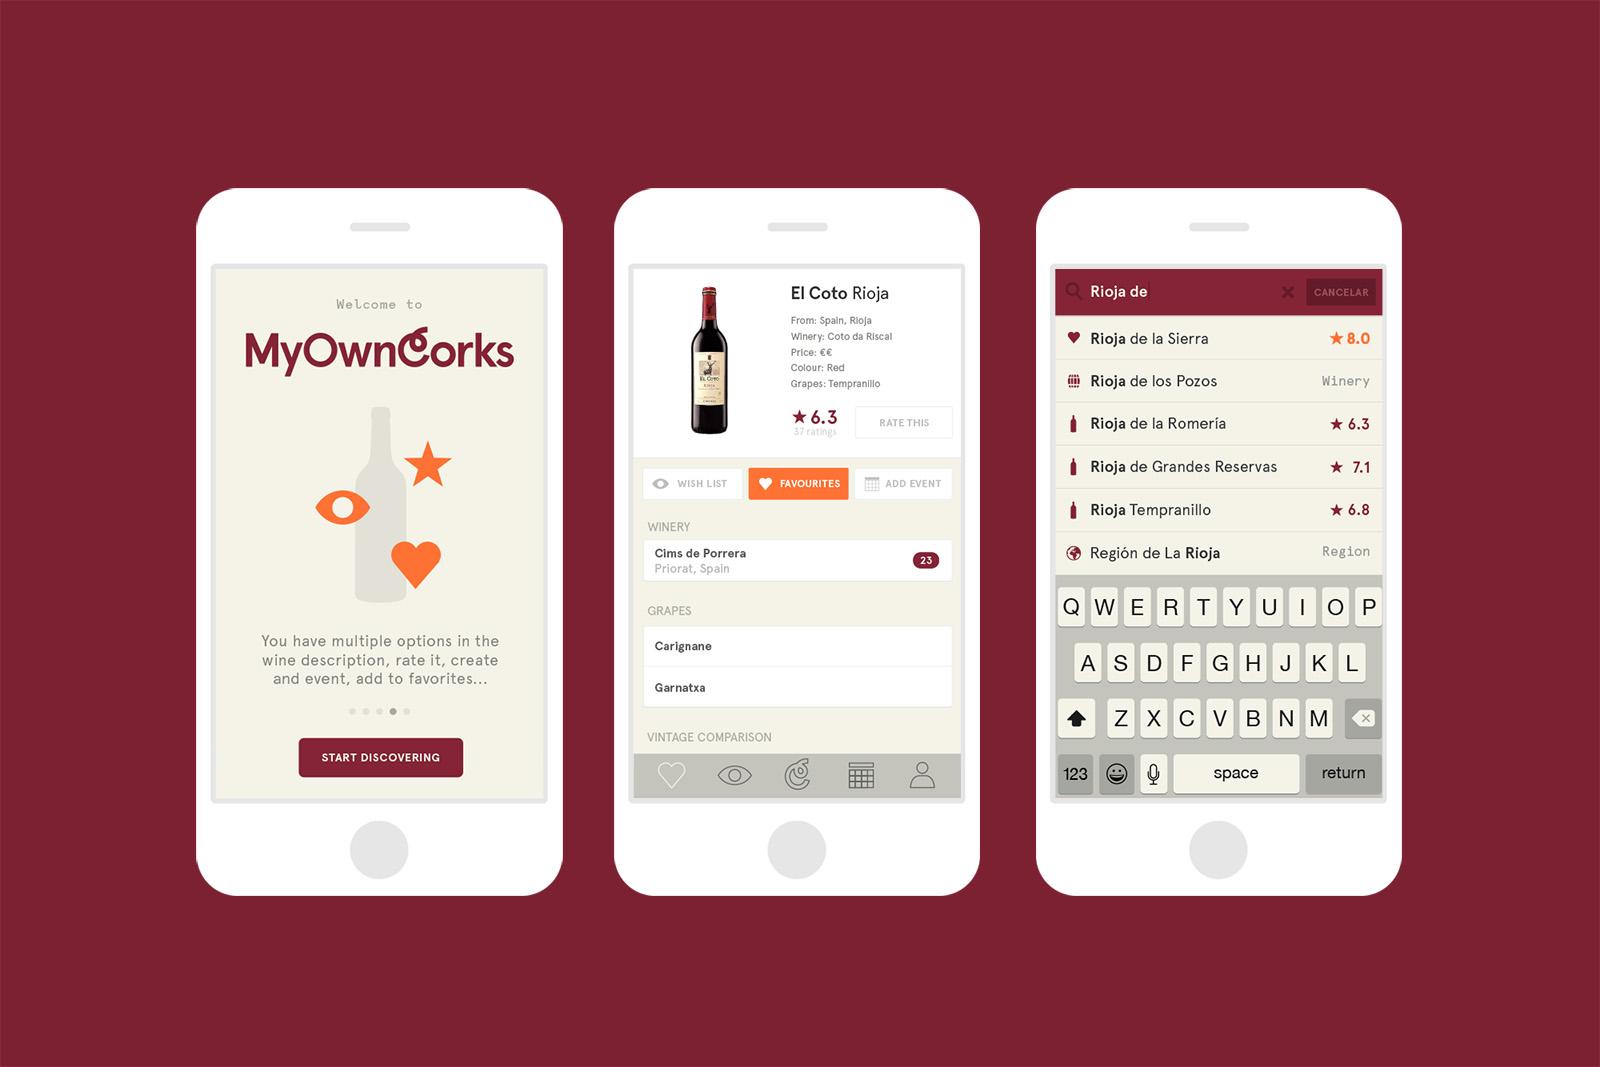 Collserola-MyOwnCorks-Mobiles